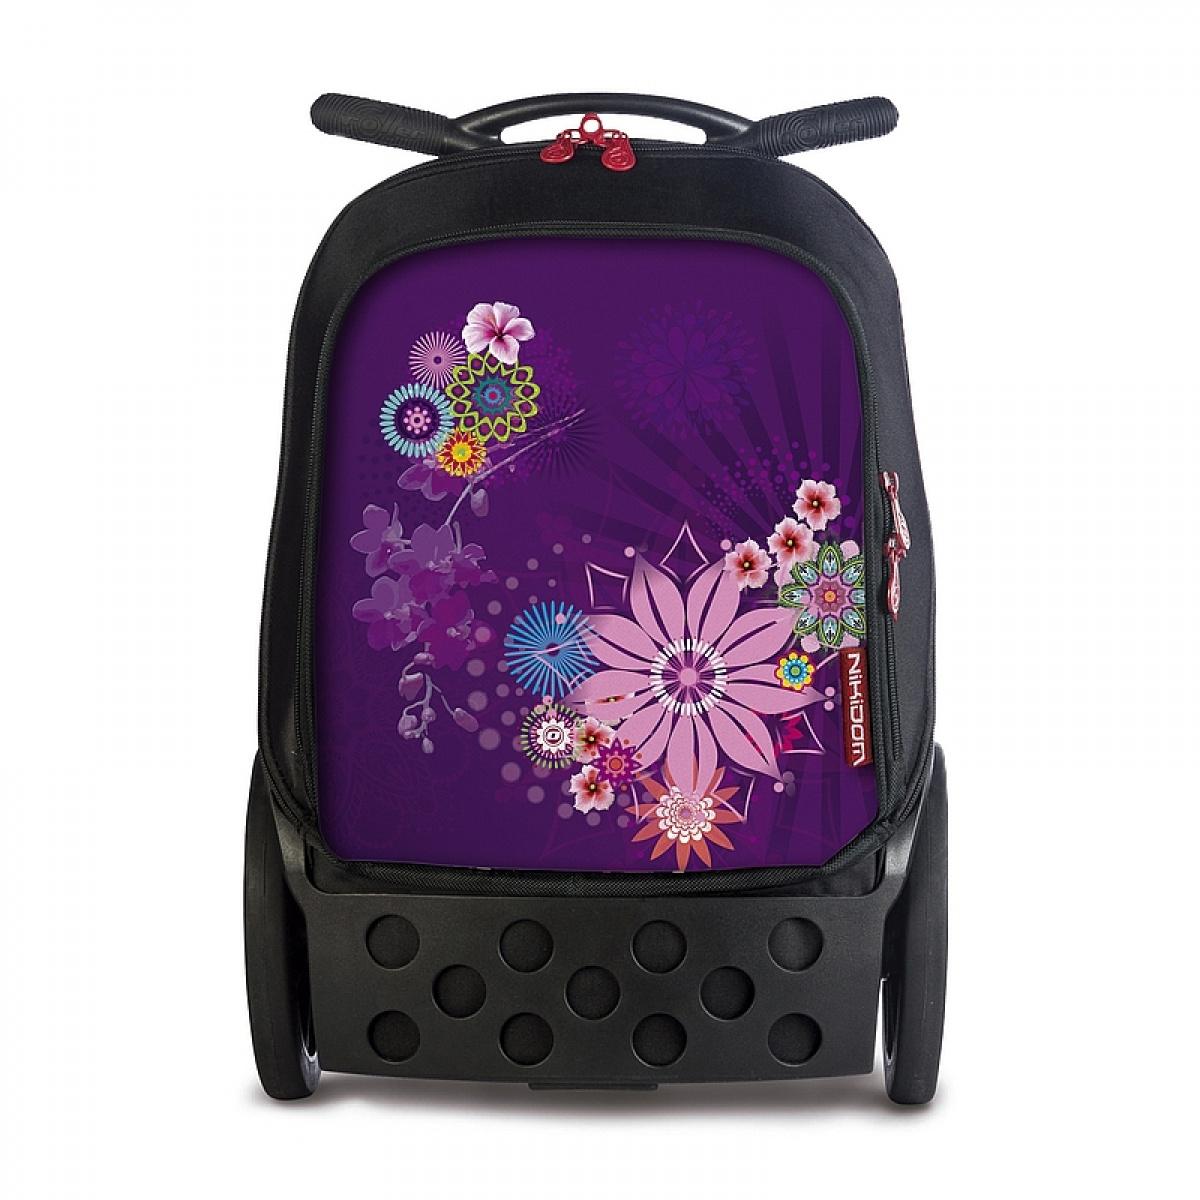 Ghiozdan Școlar Ergonomic, Tip Troller, Bloom XL, Nikidom, 9323